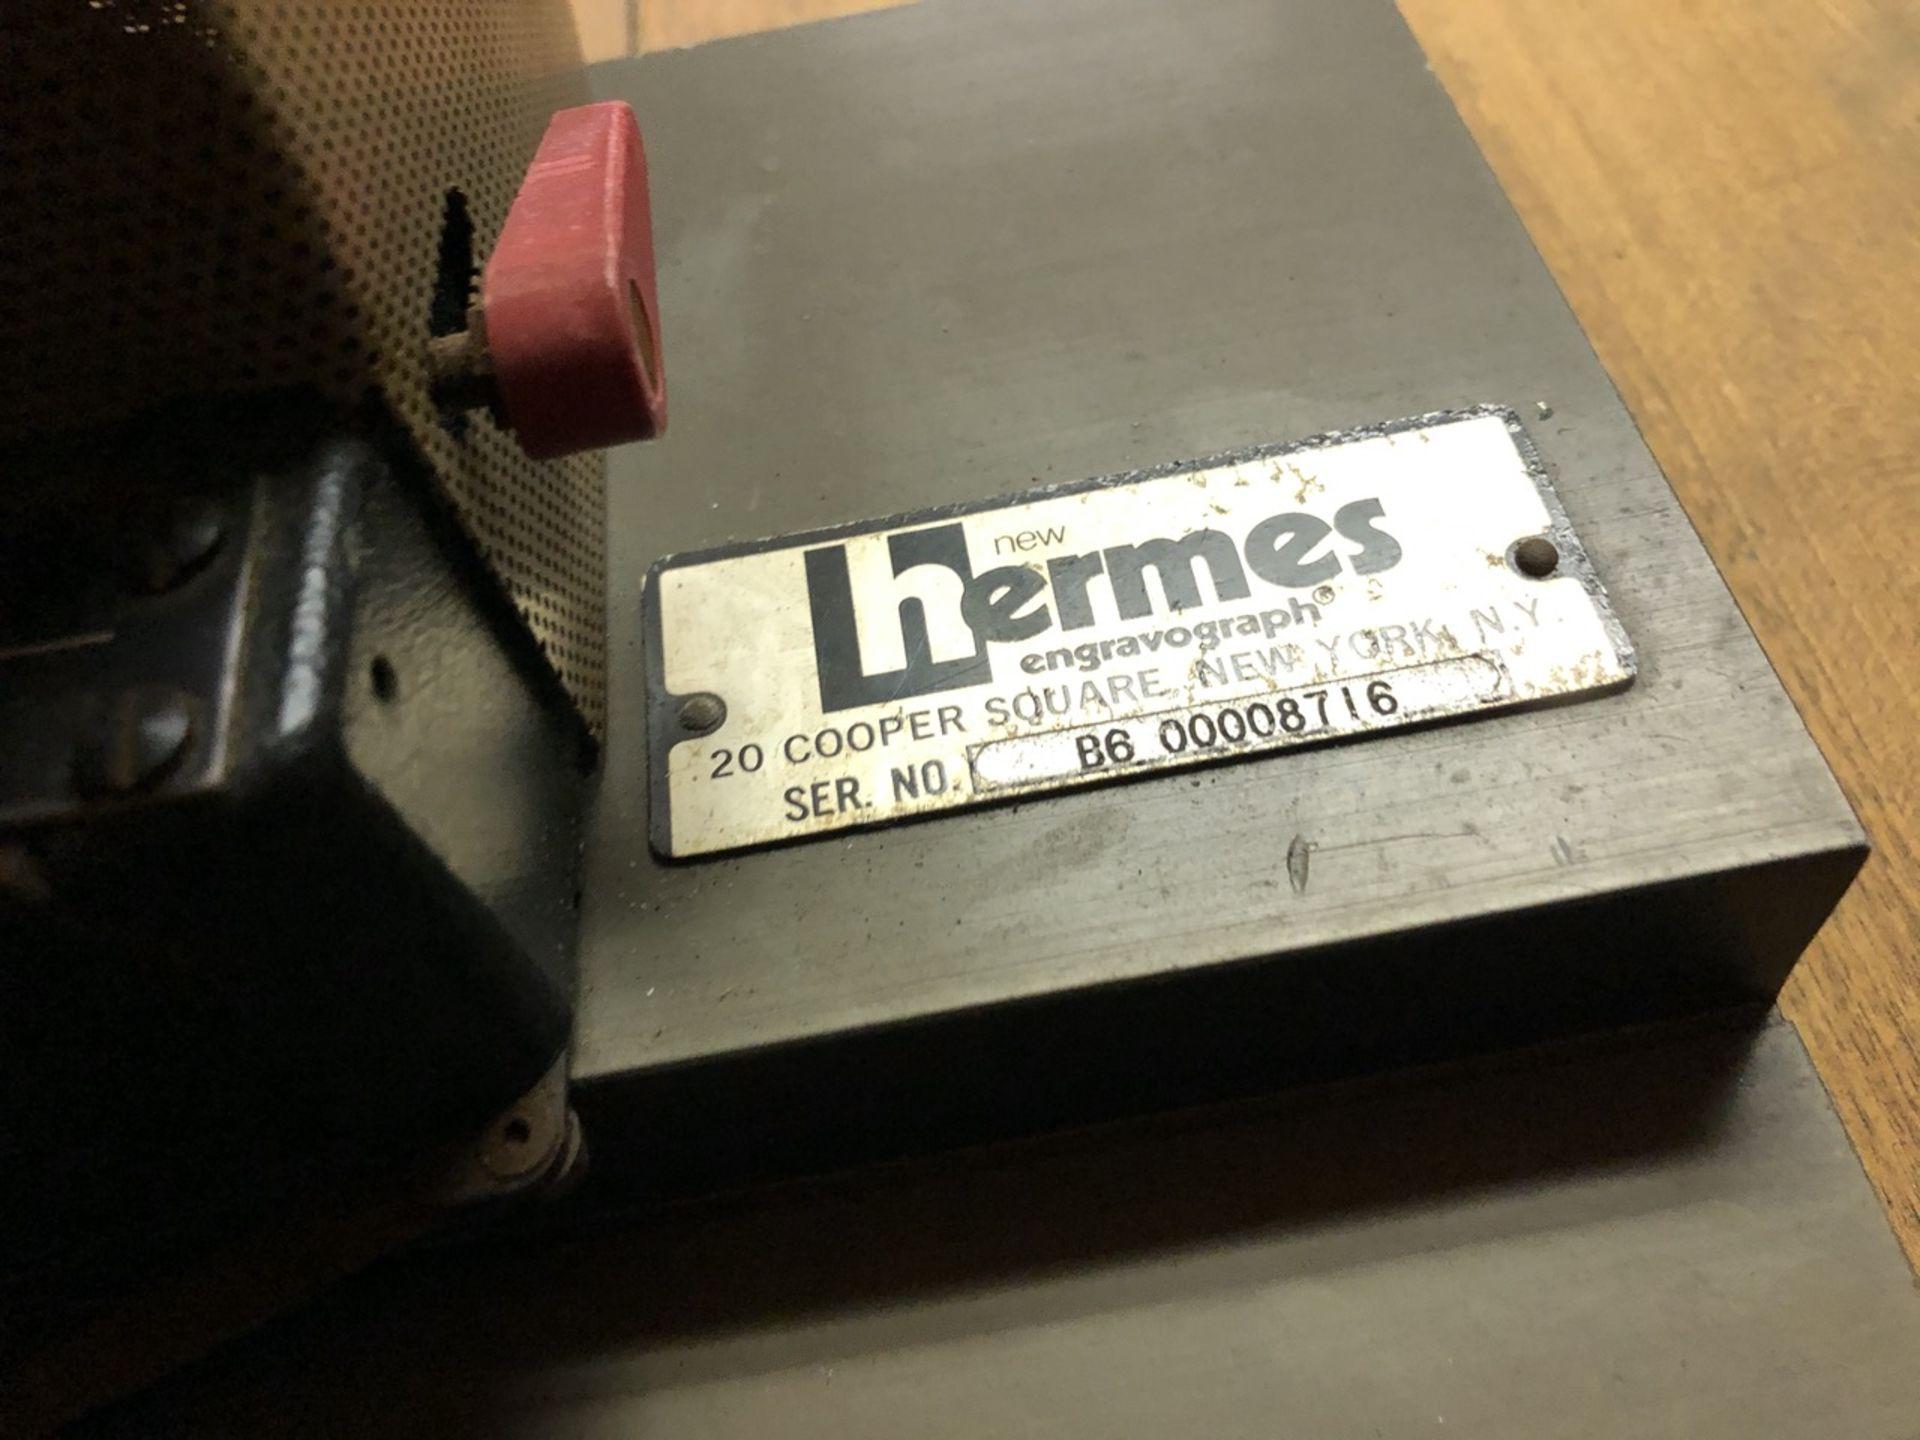 Lot 19 - Hermes Beveler Engravograph